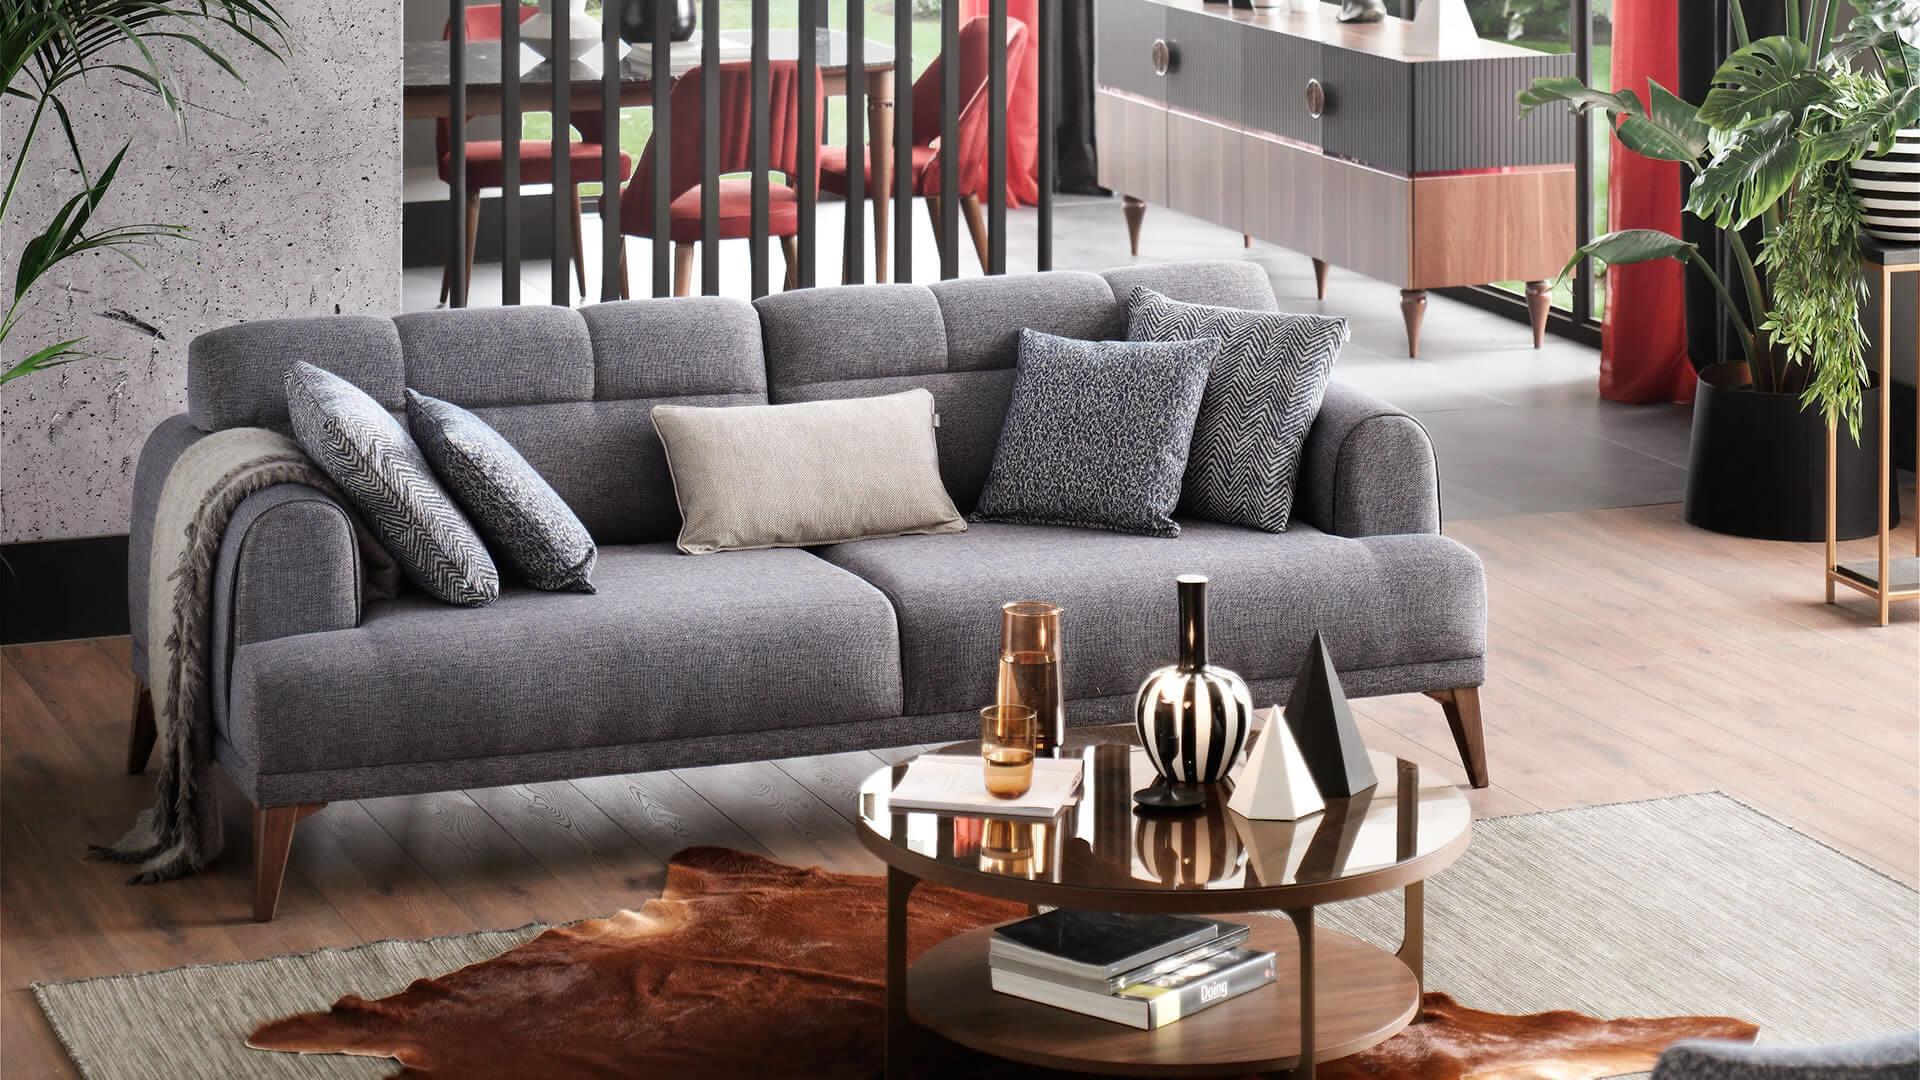 Canapea tapitata cu stofa, 3 locuri, cu functie sleep pentru 1 persoana Madrid Gri, l231xA102xH80 cm poza